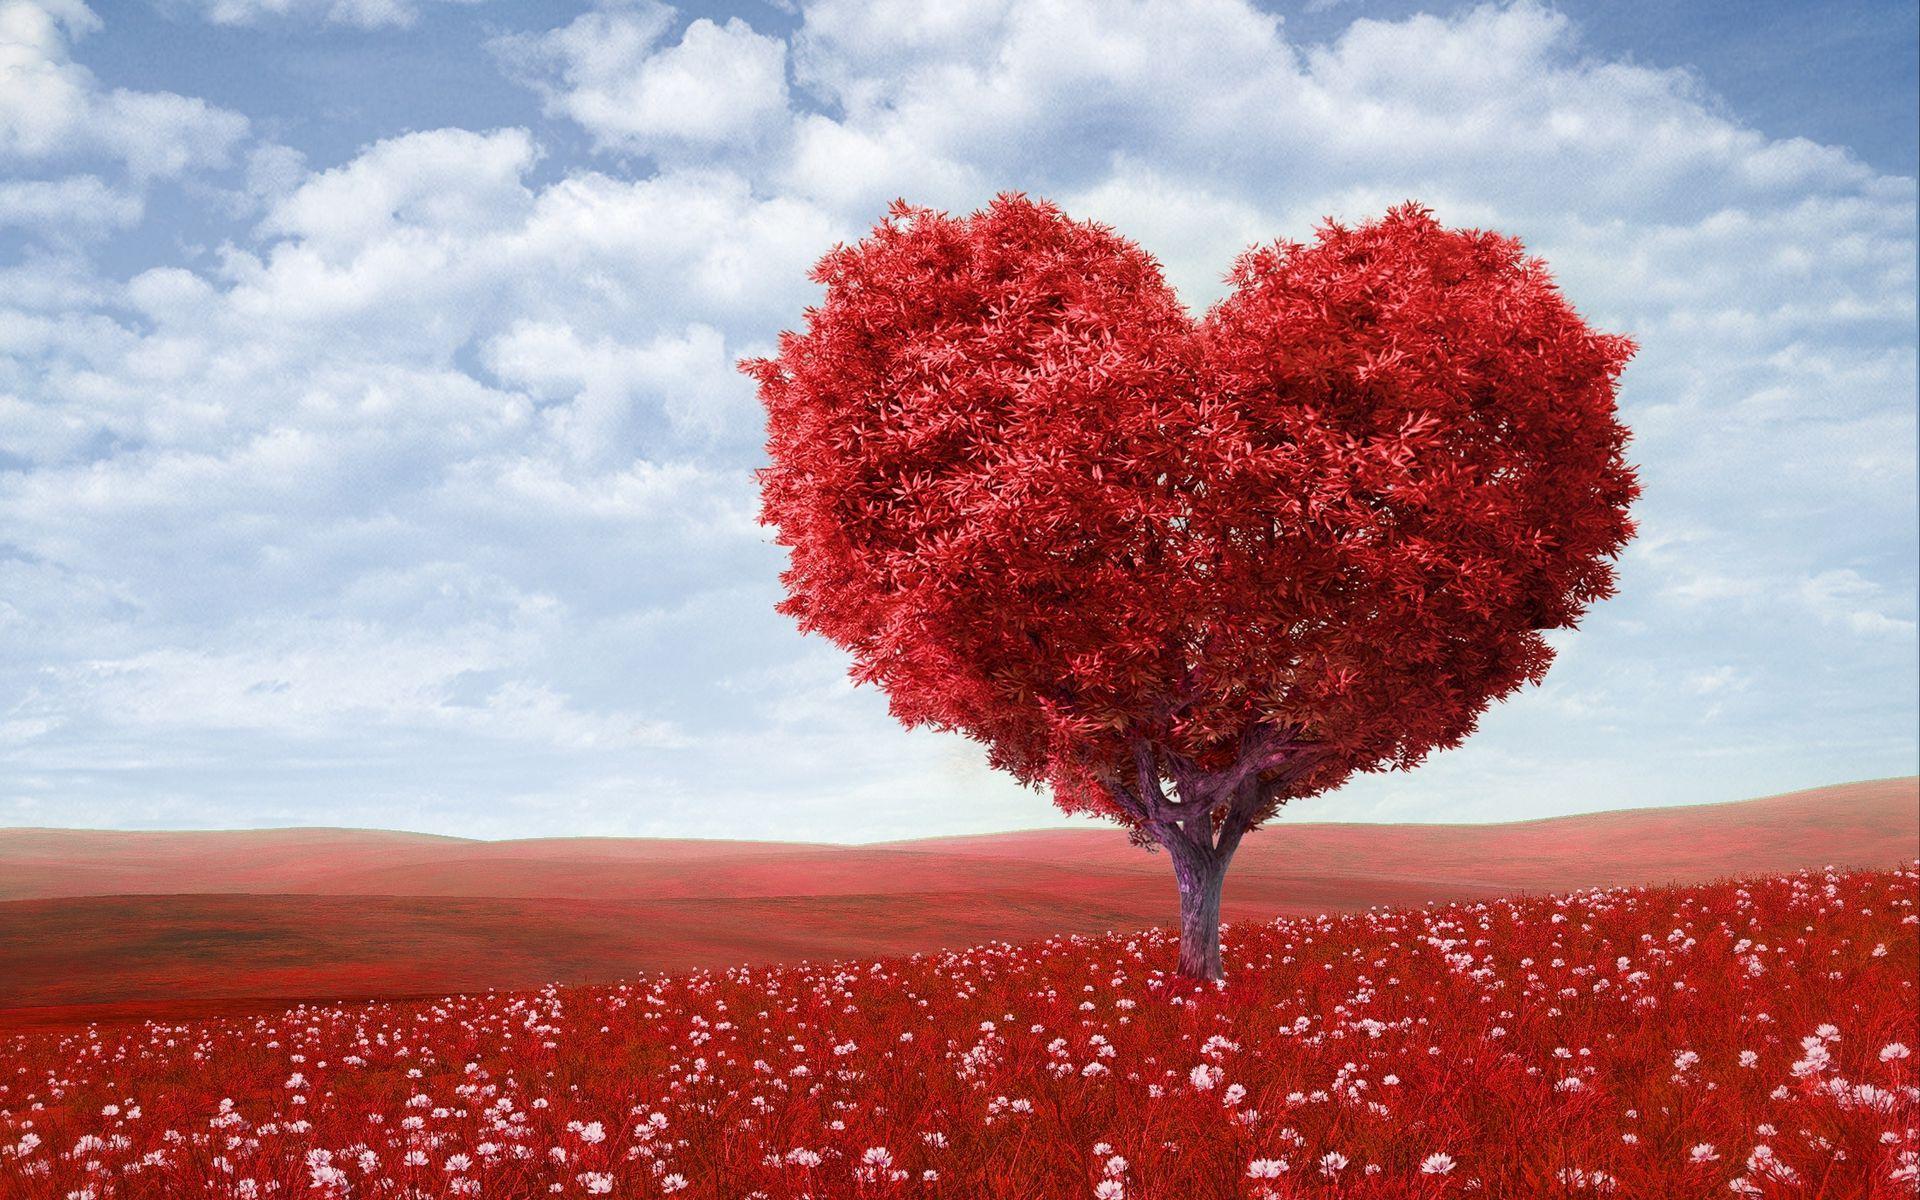 1920x1200 Wallpaper tree, heart, photoshop, field, grass, romance